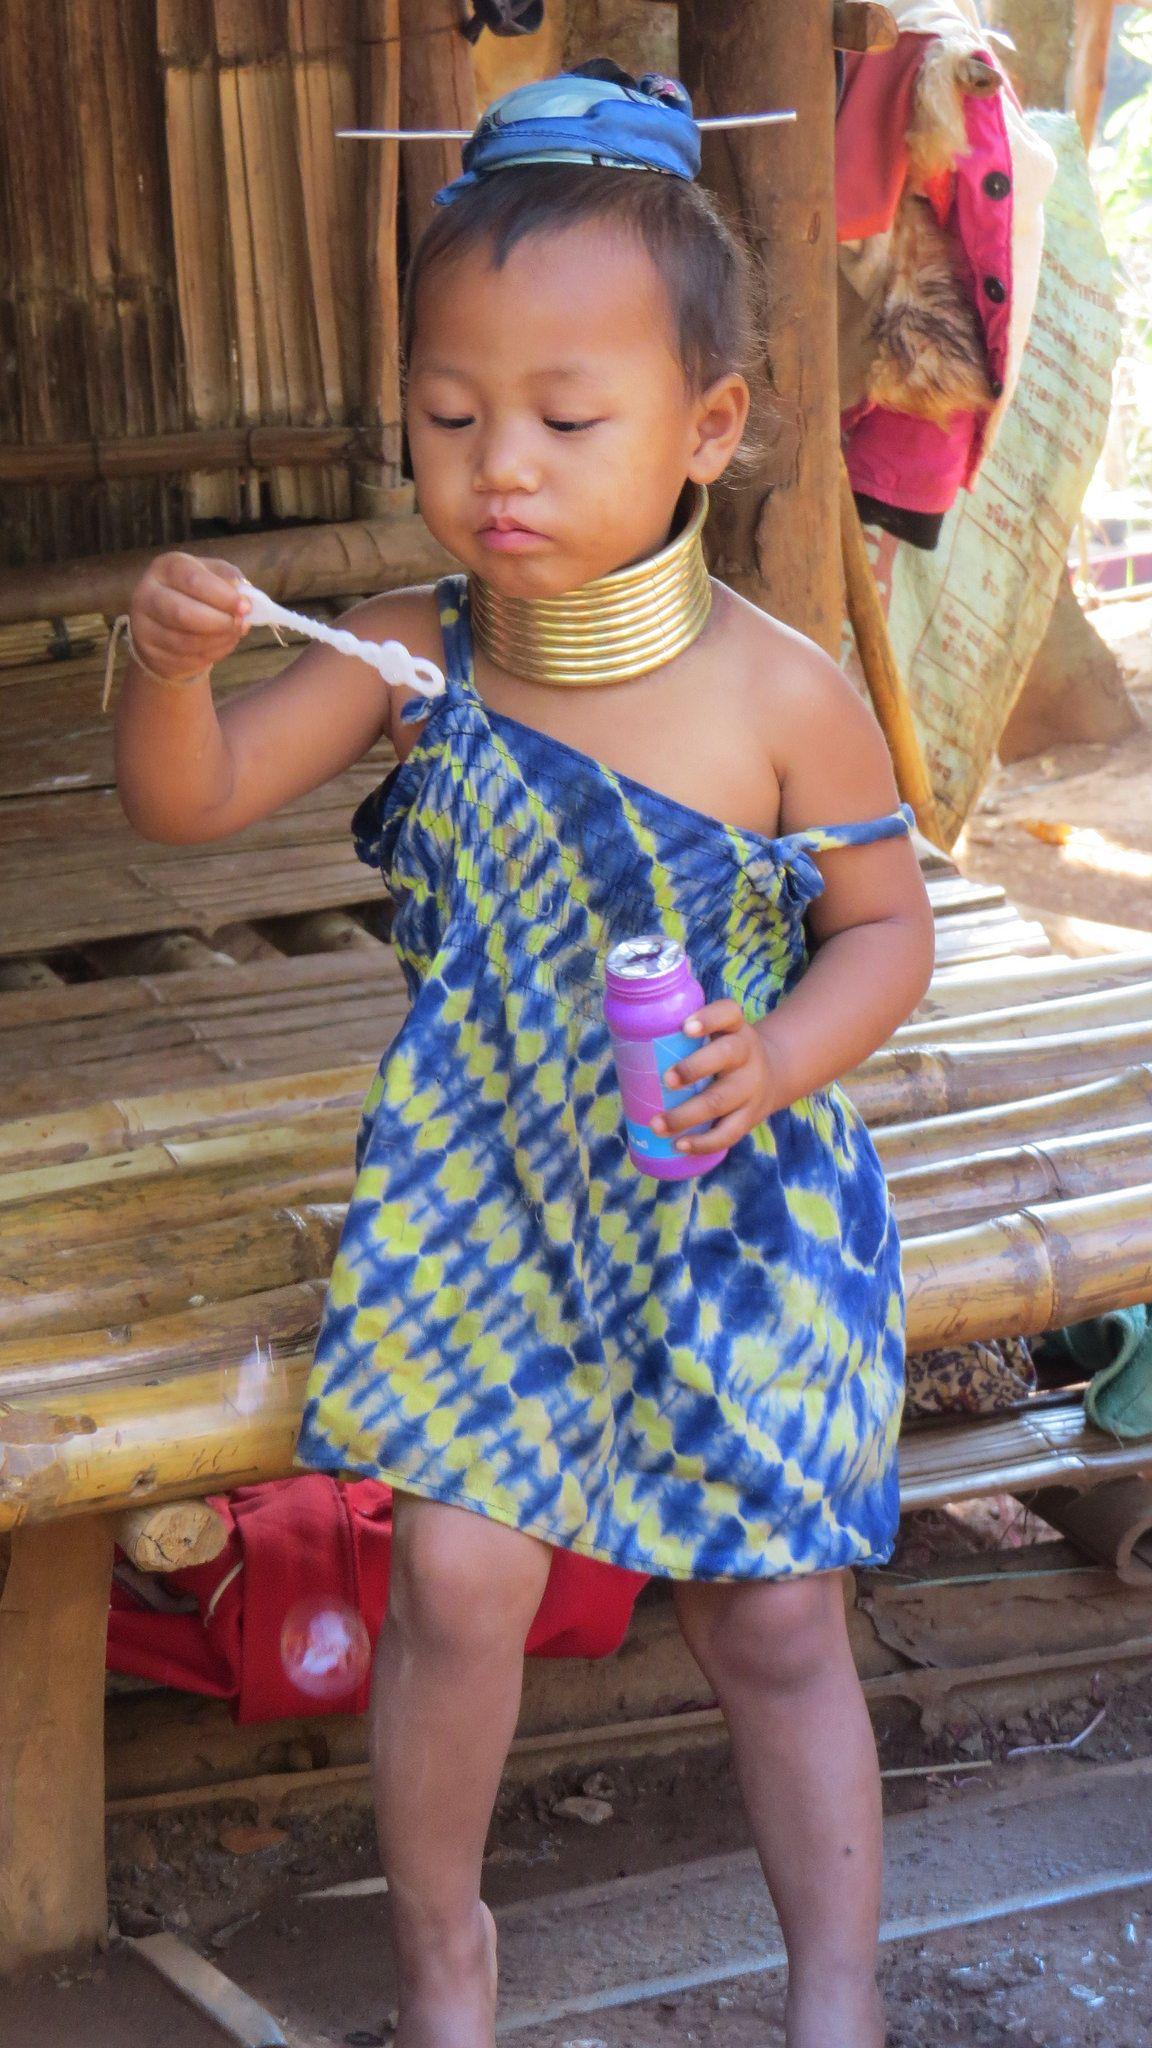 https://flic.kr/p/sbBkPD | Long neck hill tribe near Chiang Rai, Thailand |